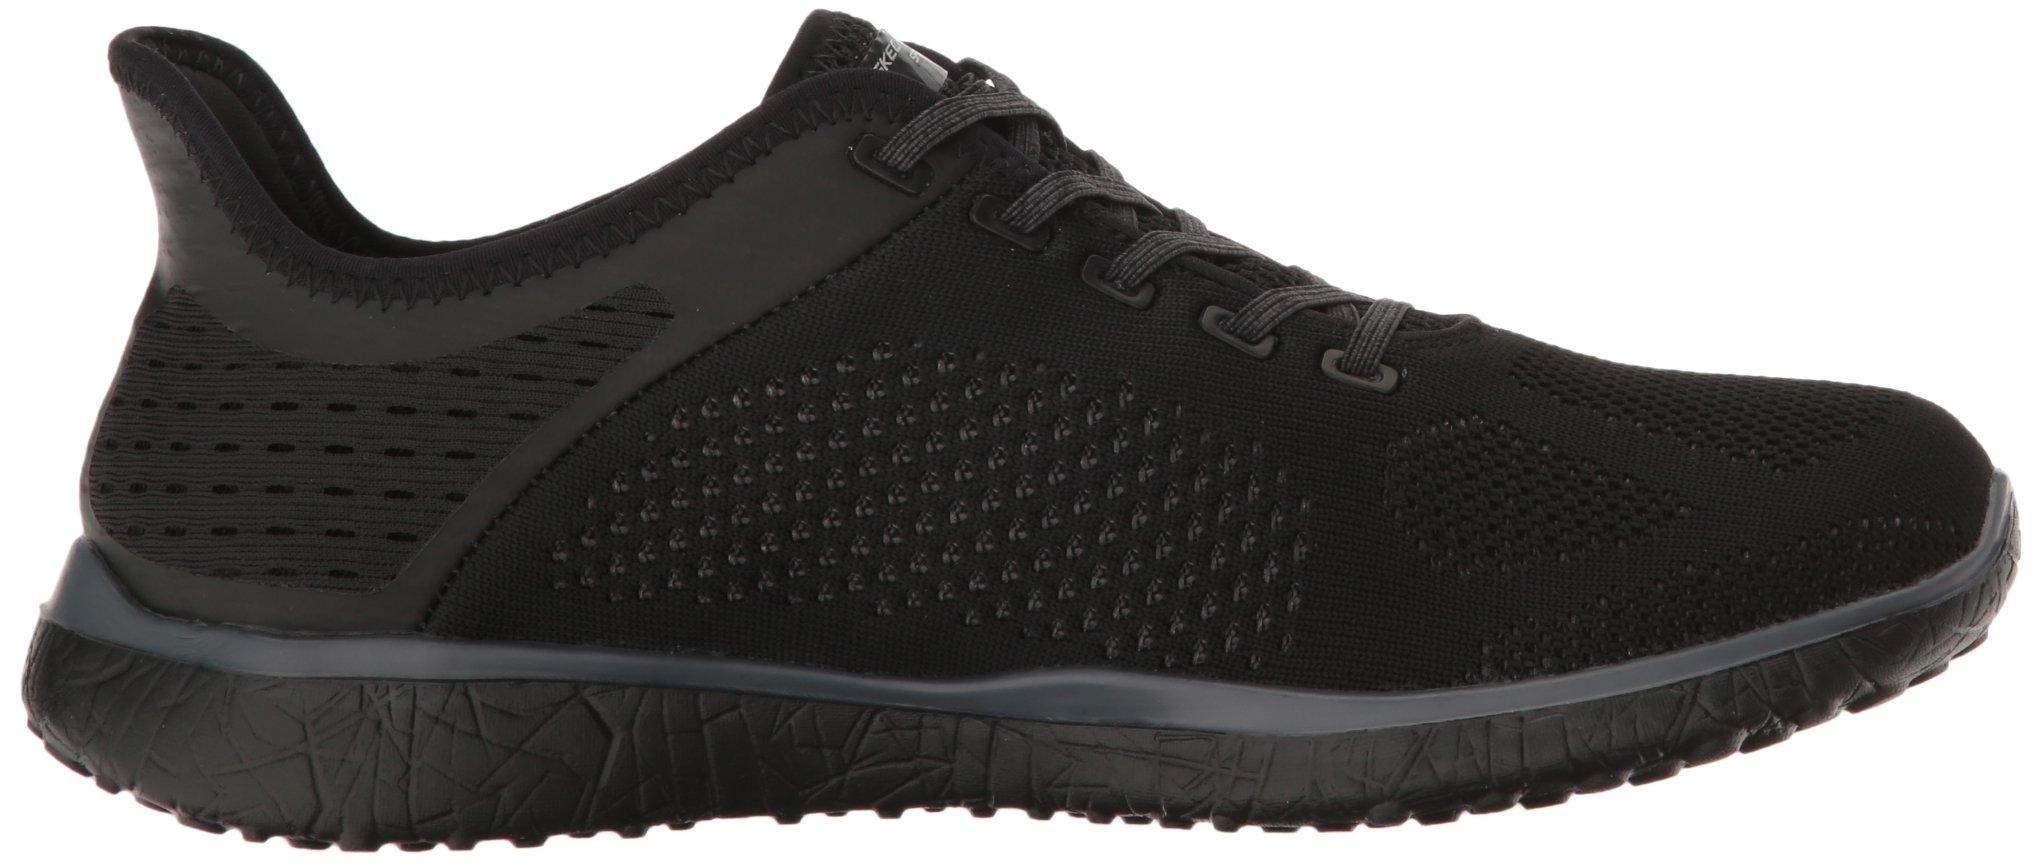 Skechers Microburst Supersonic 23327 Black BBK Sneaker Memory Foam